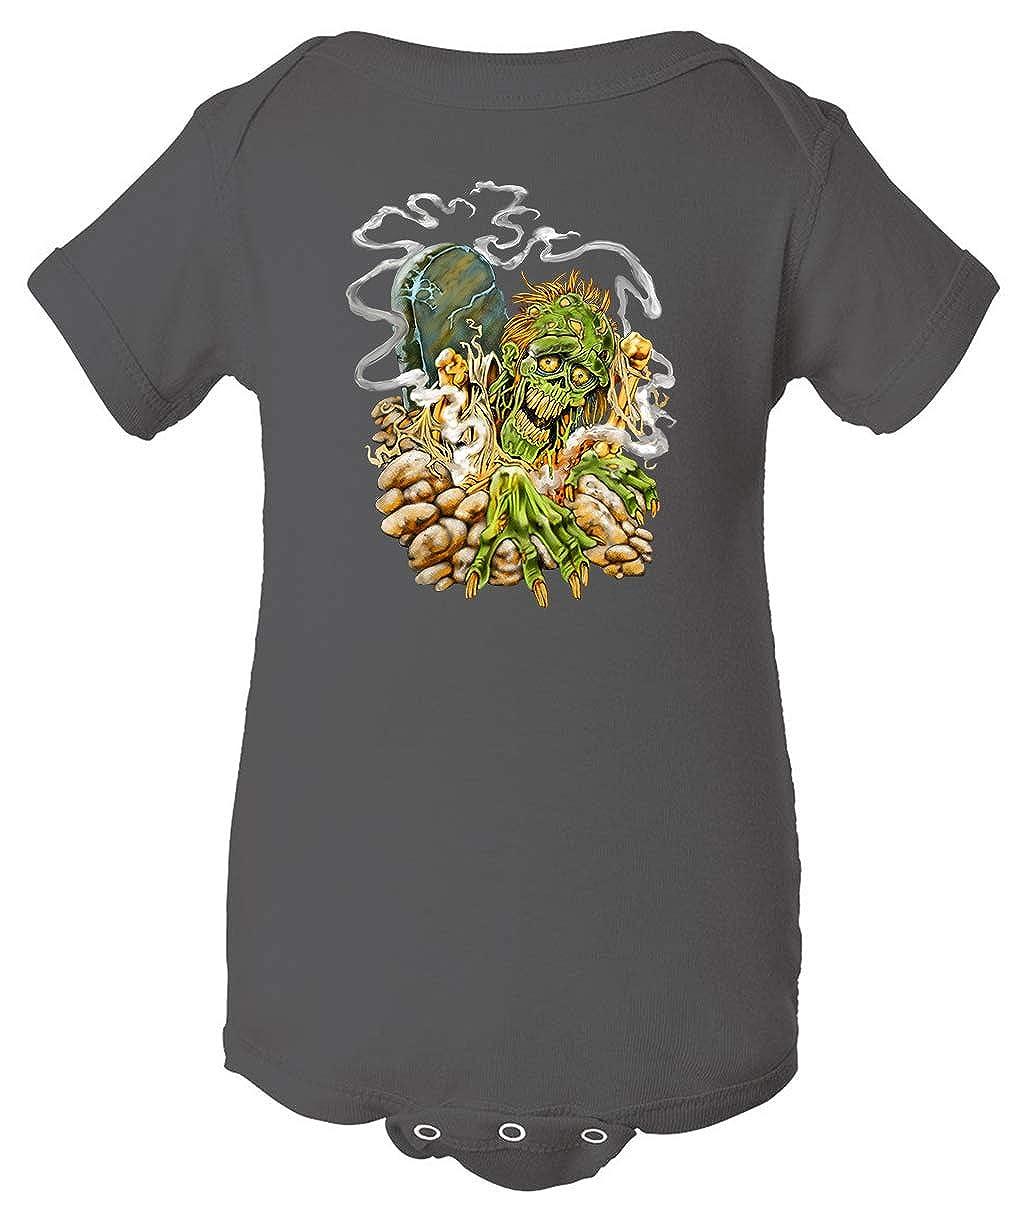 Tenacitee Babys Zombie Graveyard Shirt